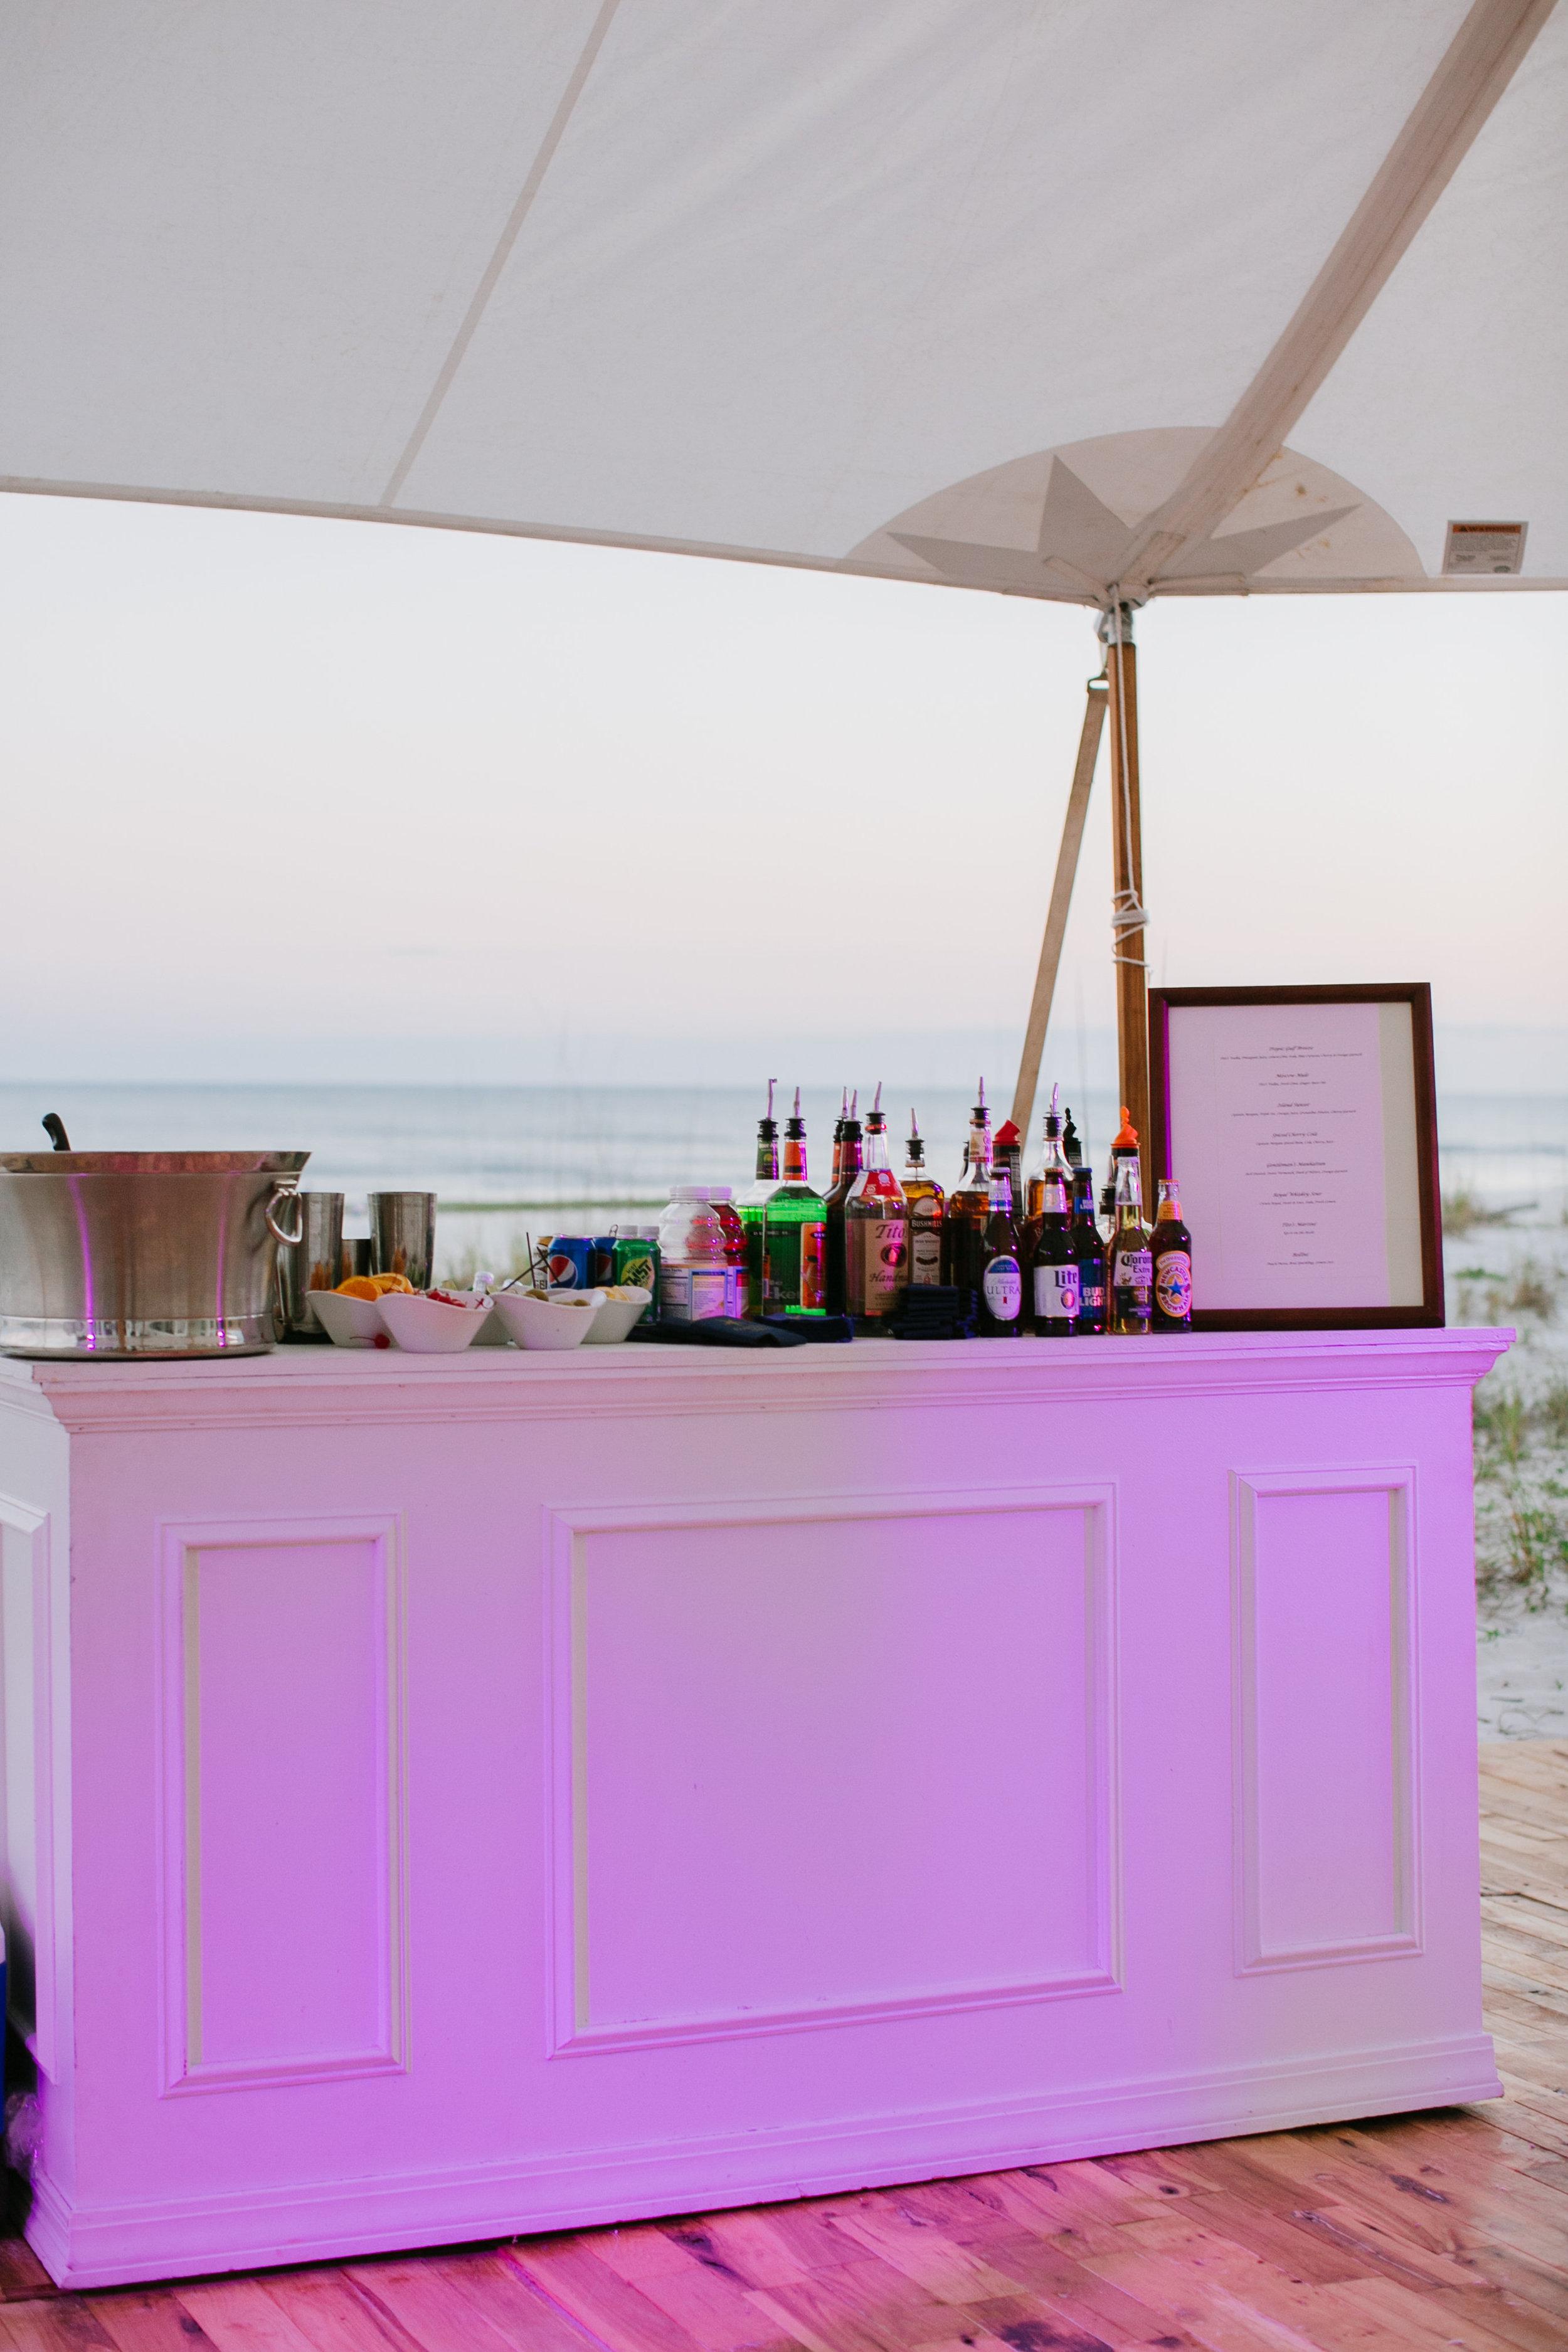 Copy of Whalen Wedding   Jenna Laine, Rumors Beach House, Dragonfly Photo.jpg